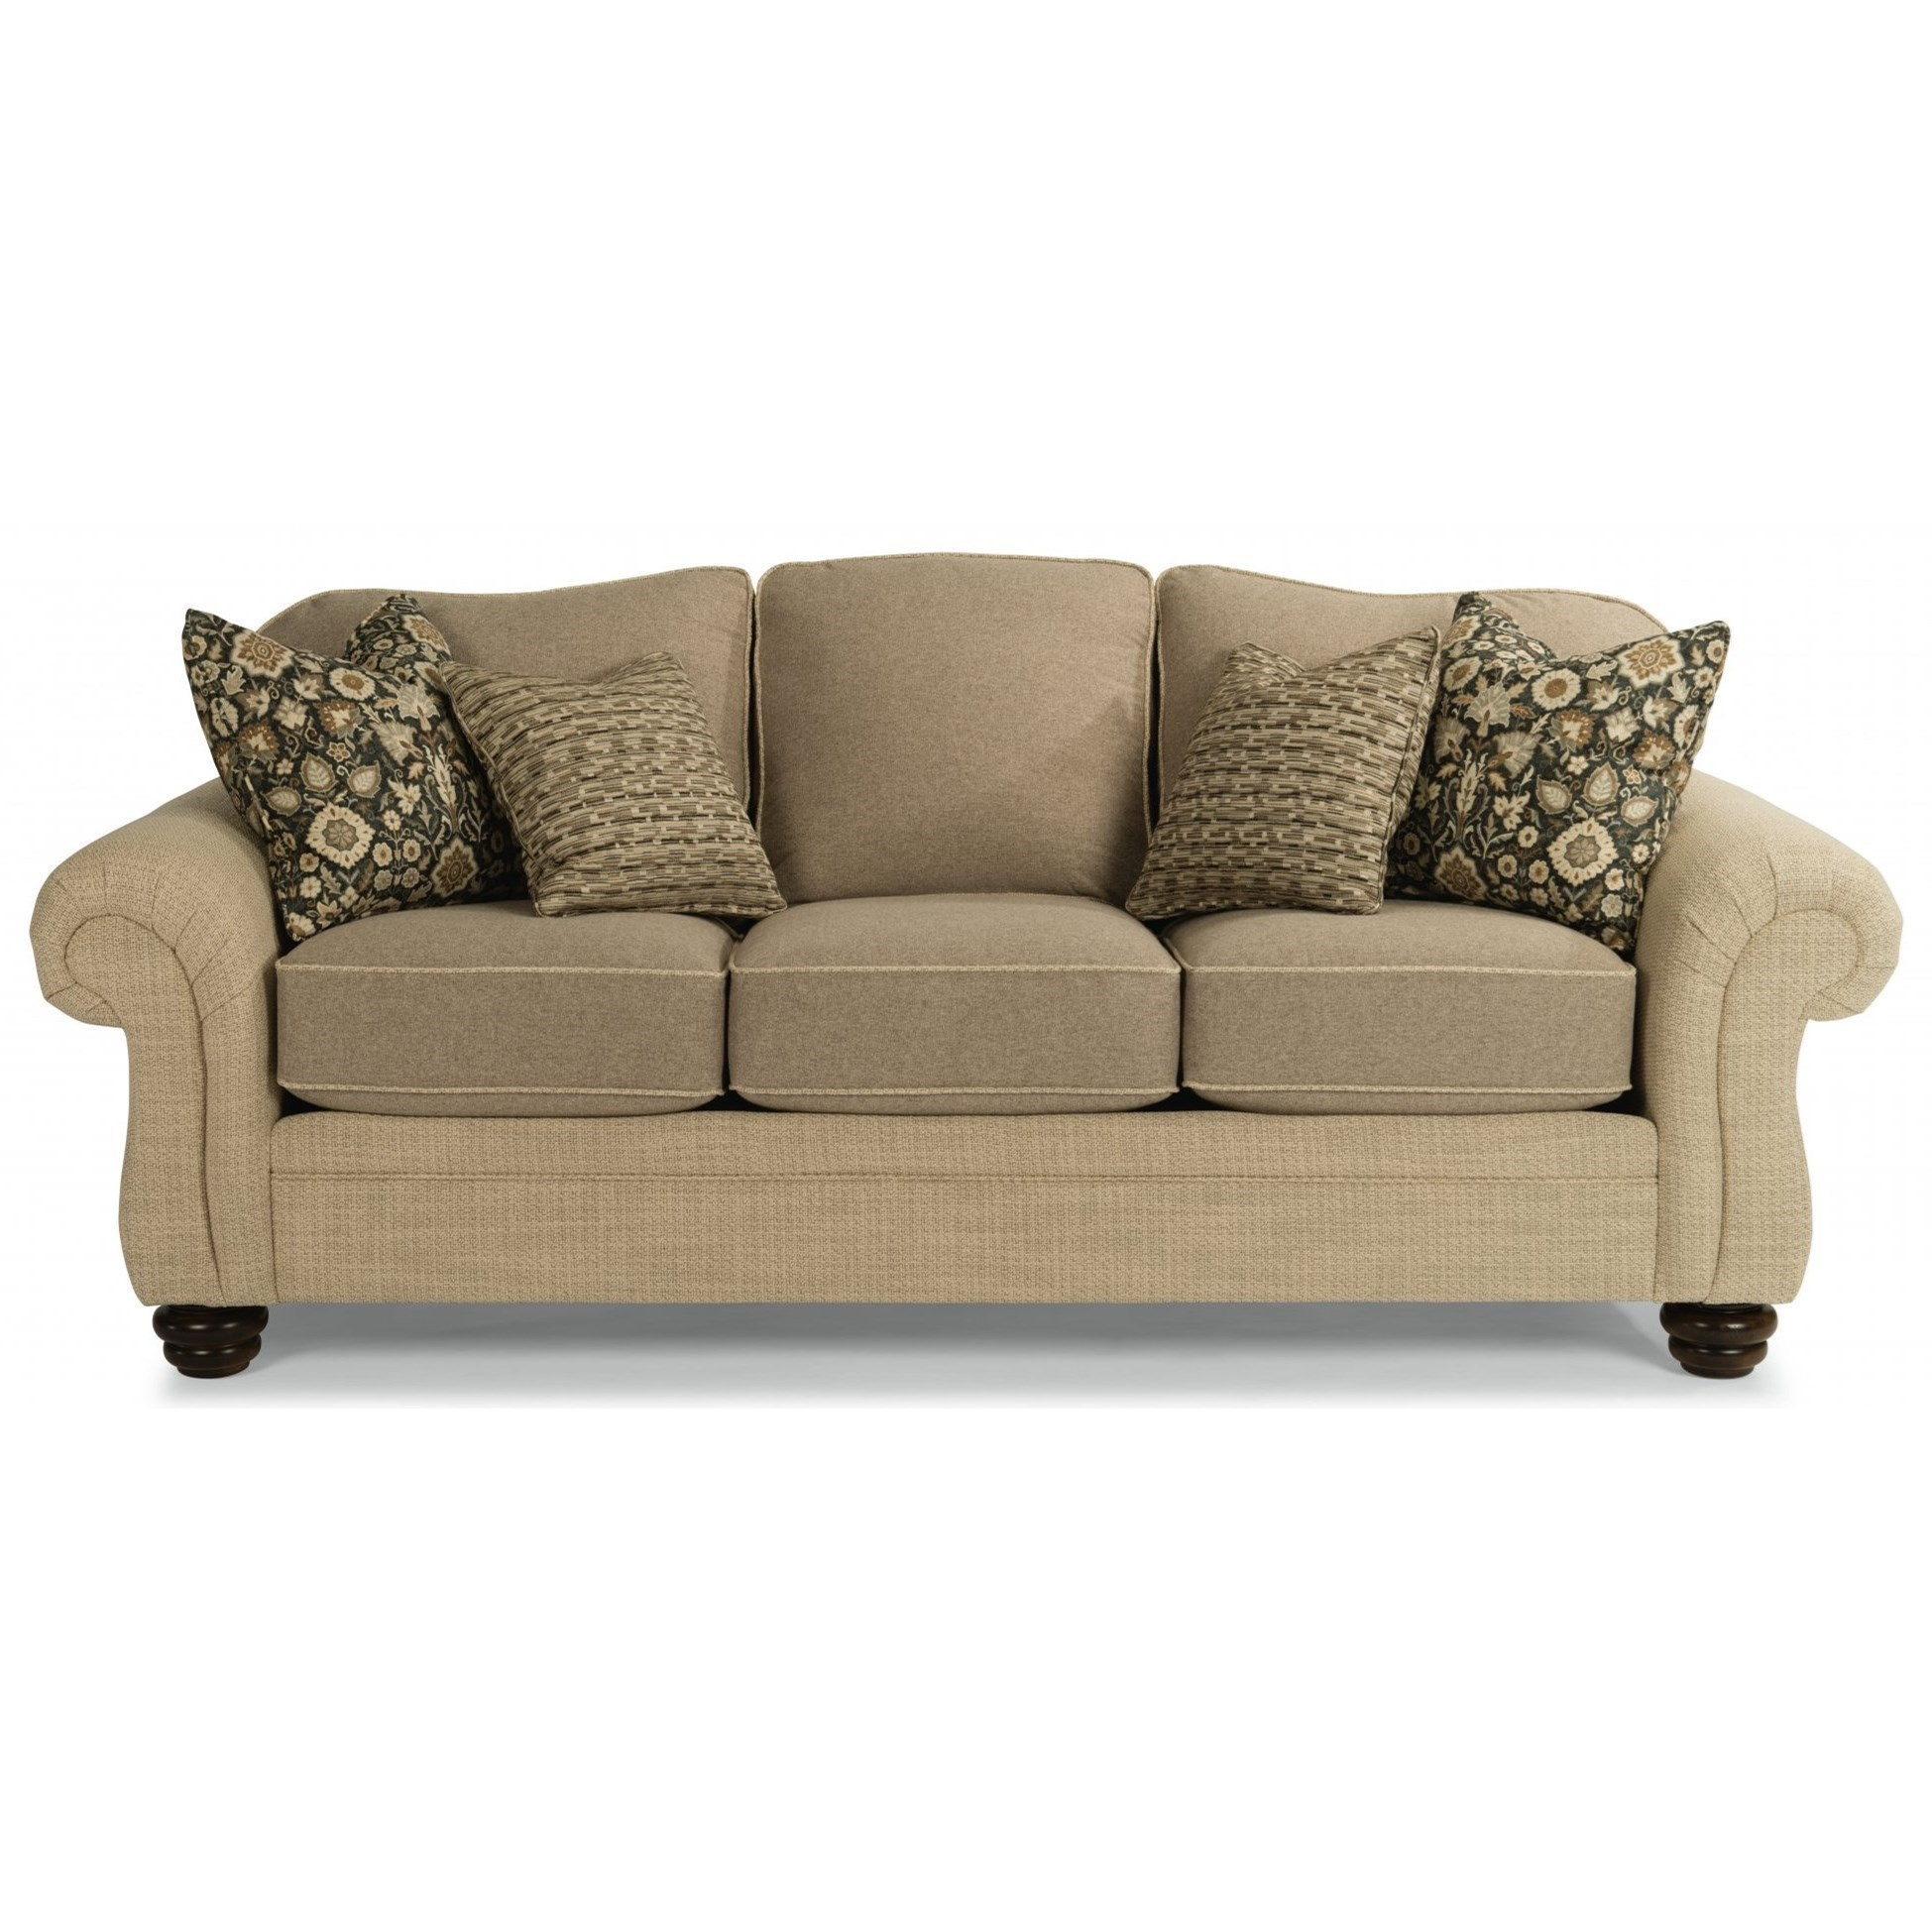 Bexley Sofa w/ Nails  by Flexsteel at Jordan's Home Furnishings